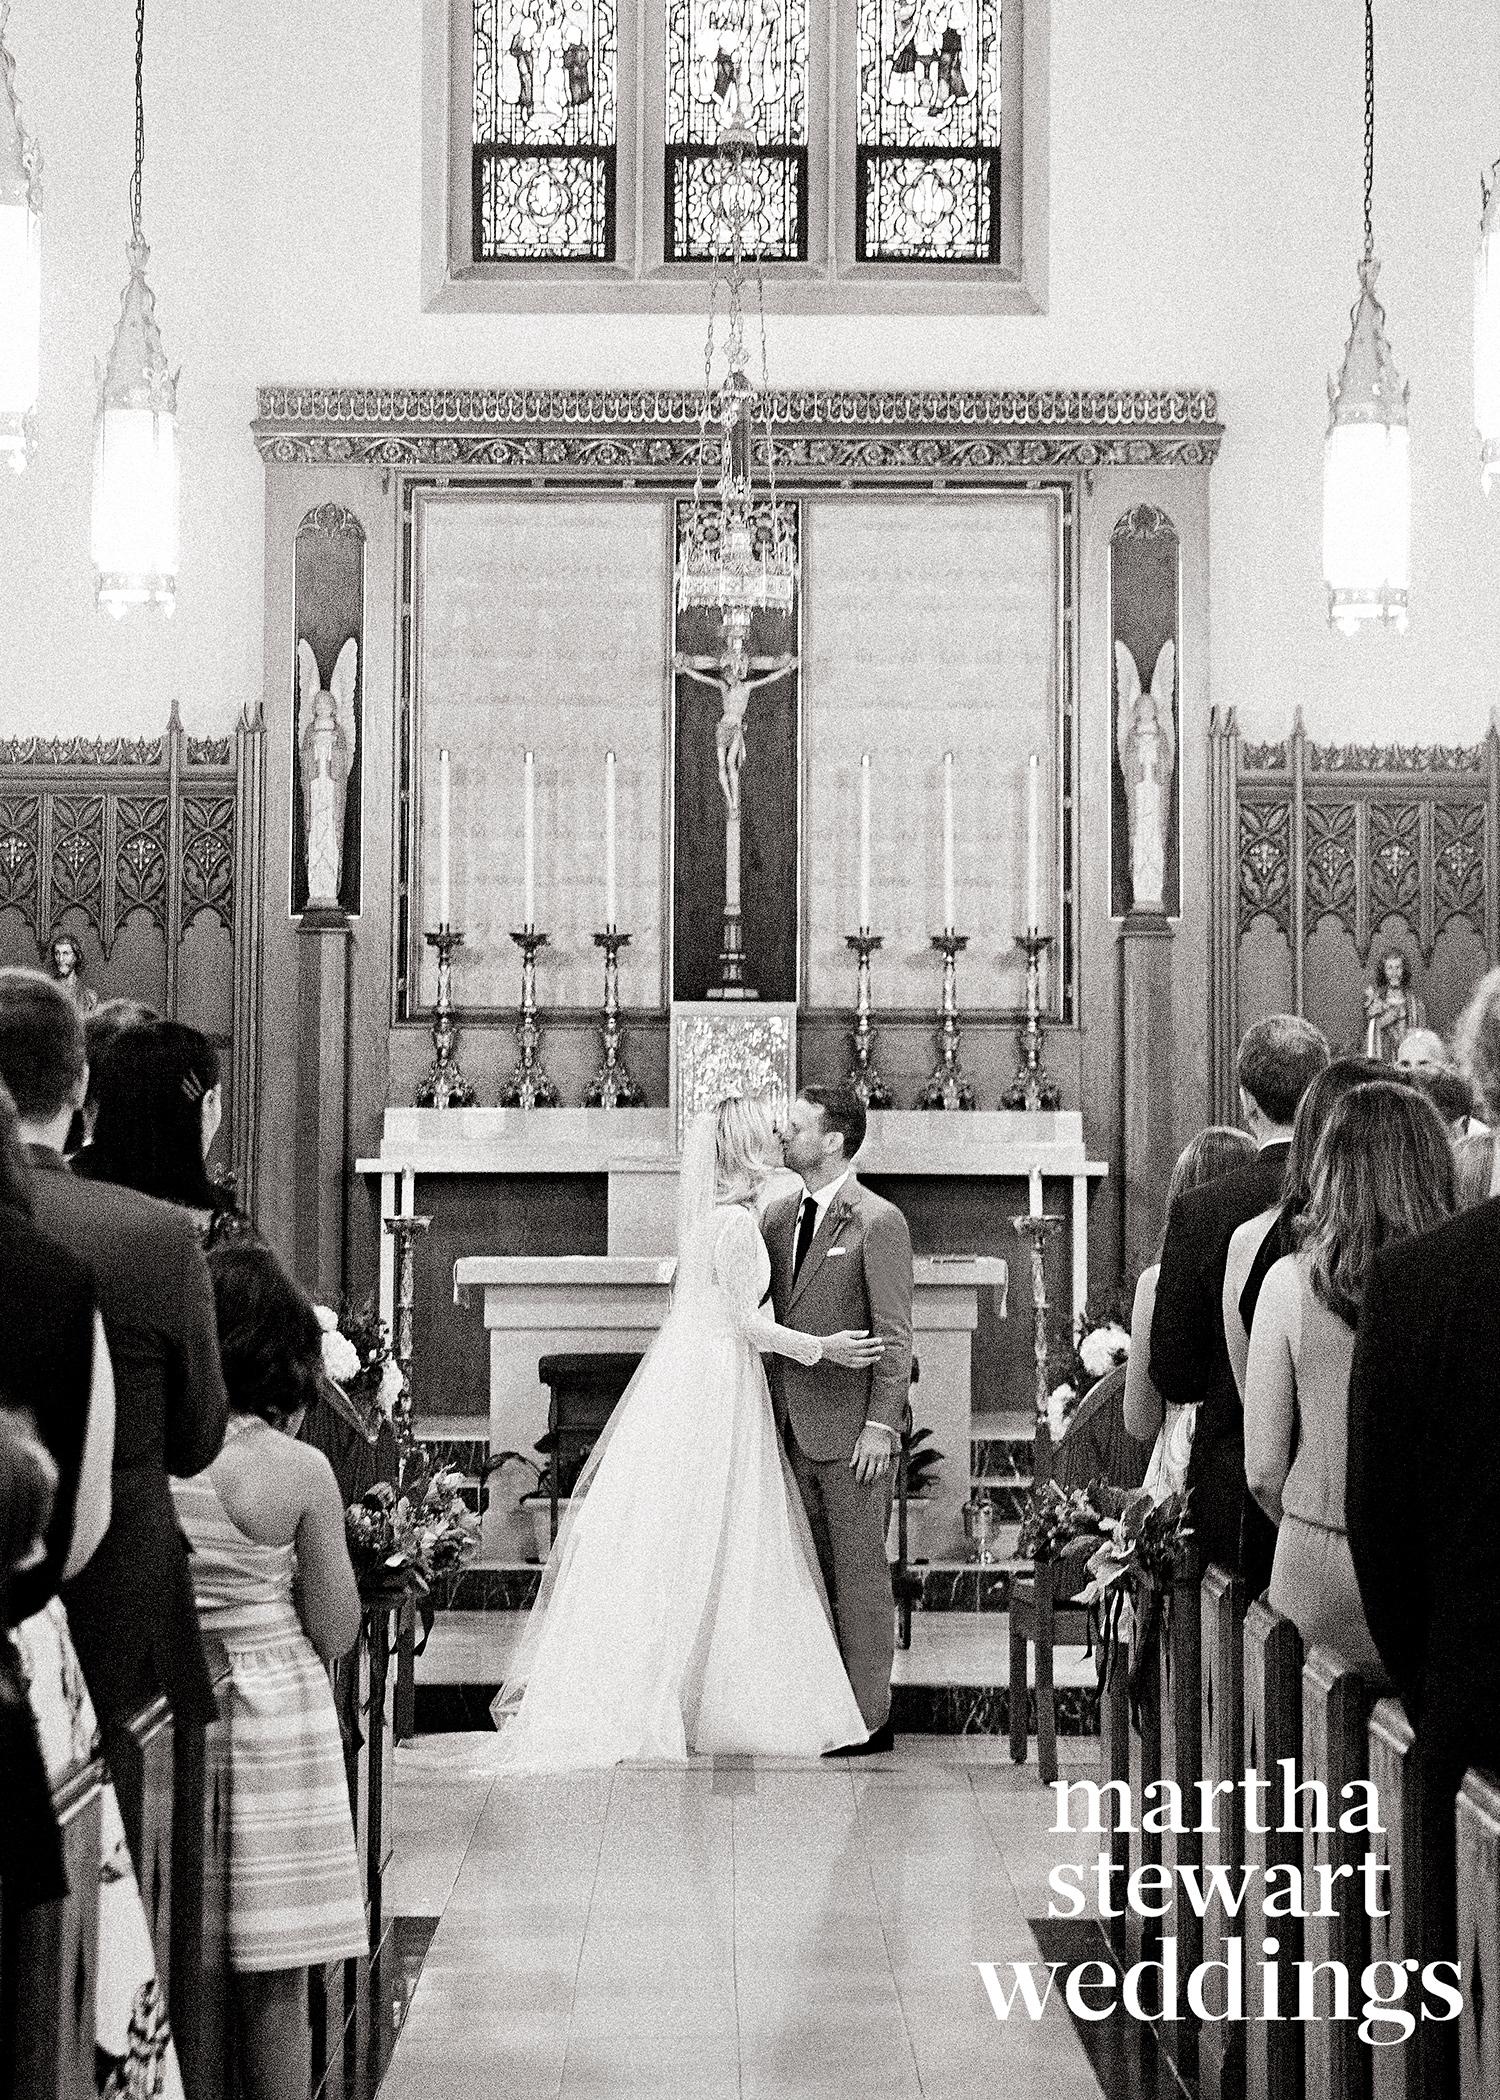 abby elliott bill kennedy wedding ceremony